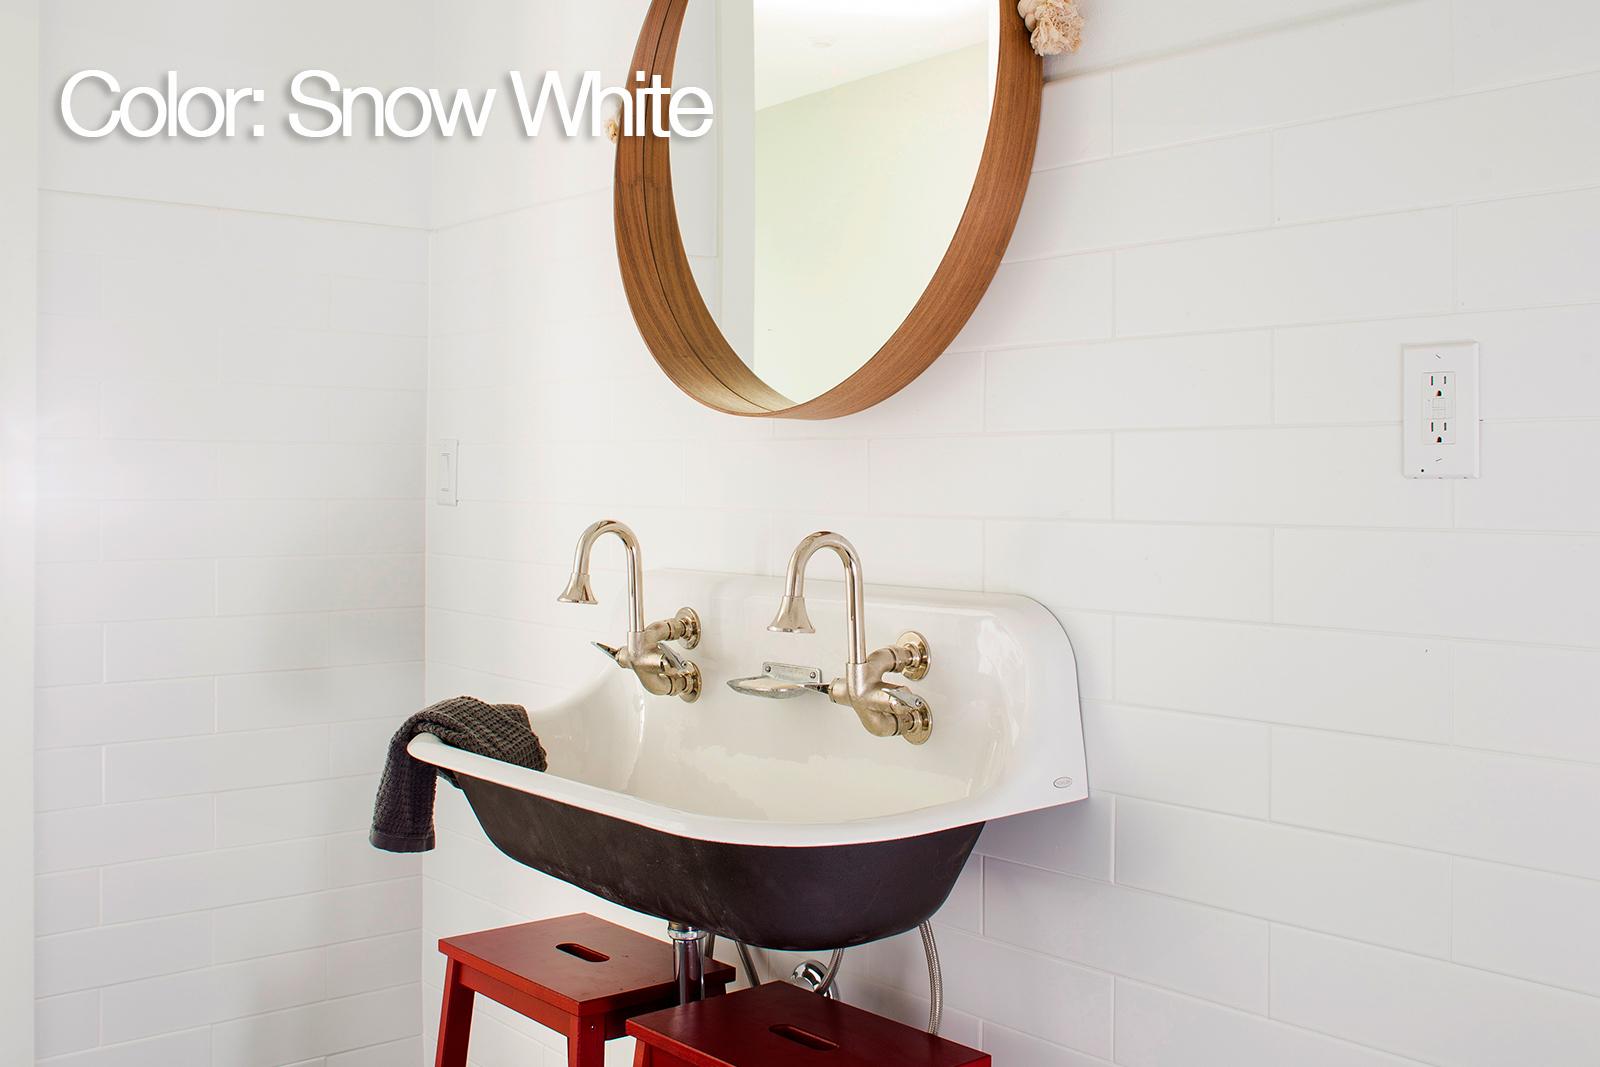 Us ceramic tile bright snow white columbialabelsfo 4x16 subway tile home depot ceramic tile bright snow white choice dailygadgetfo Gallery